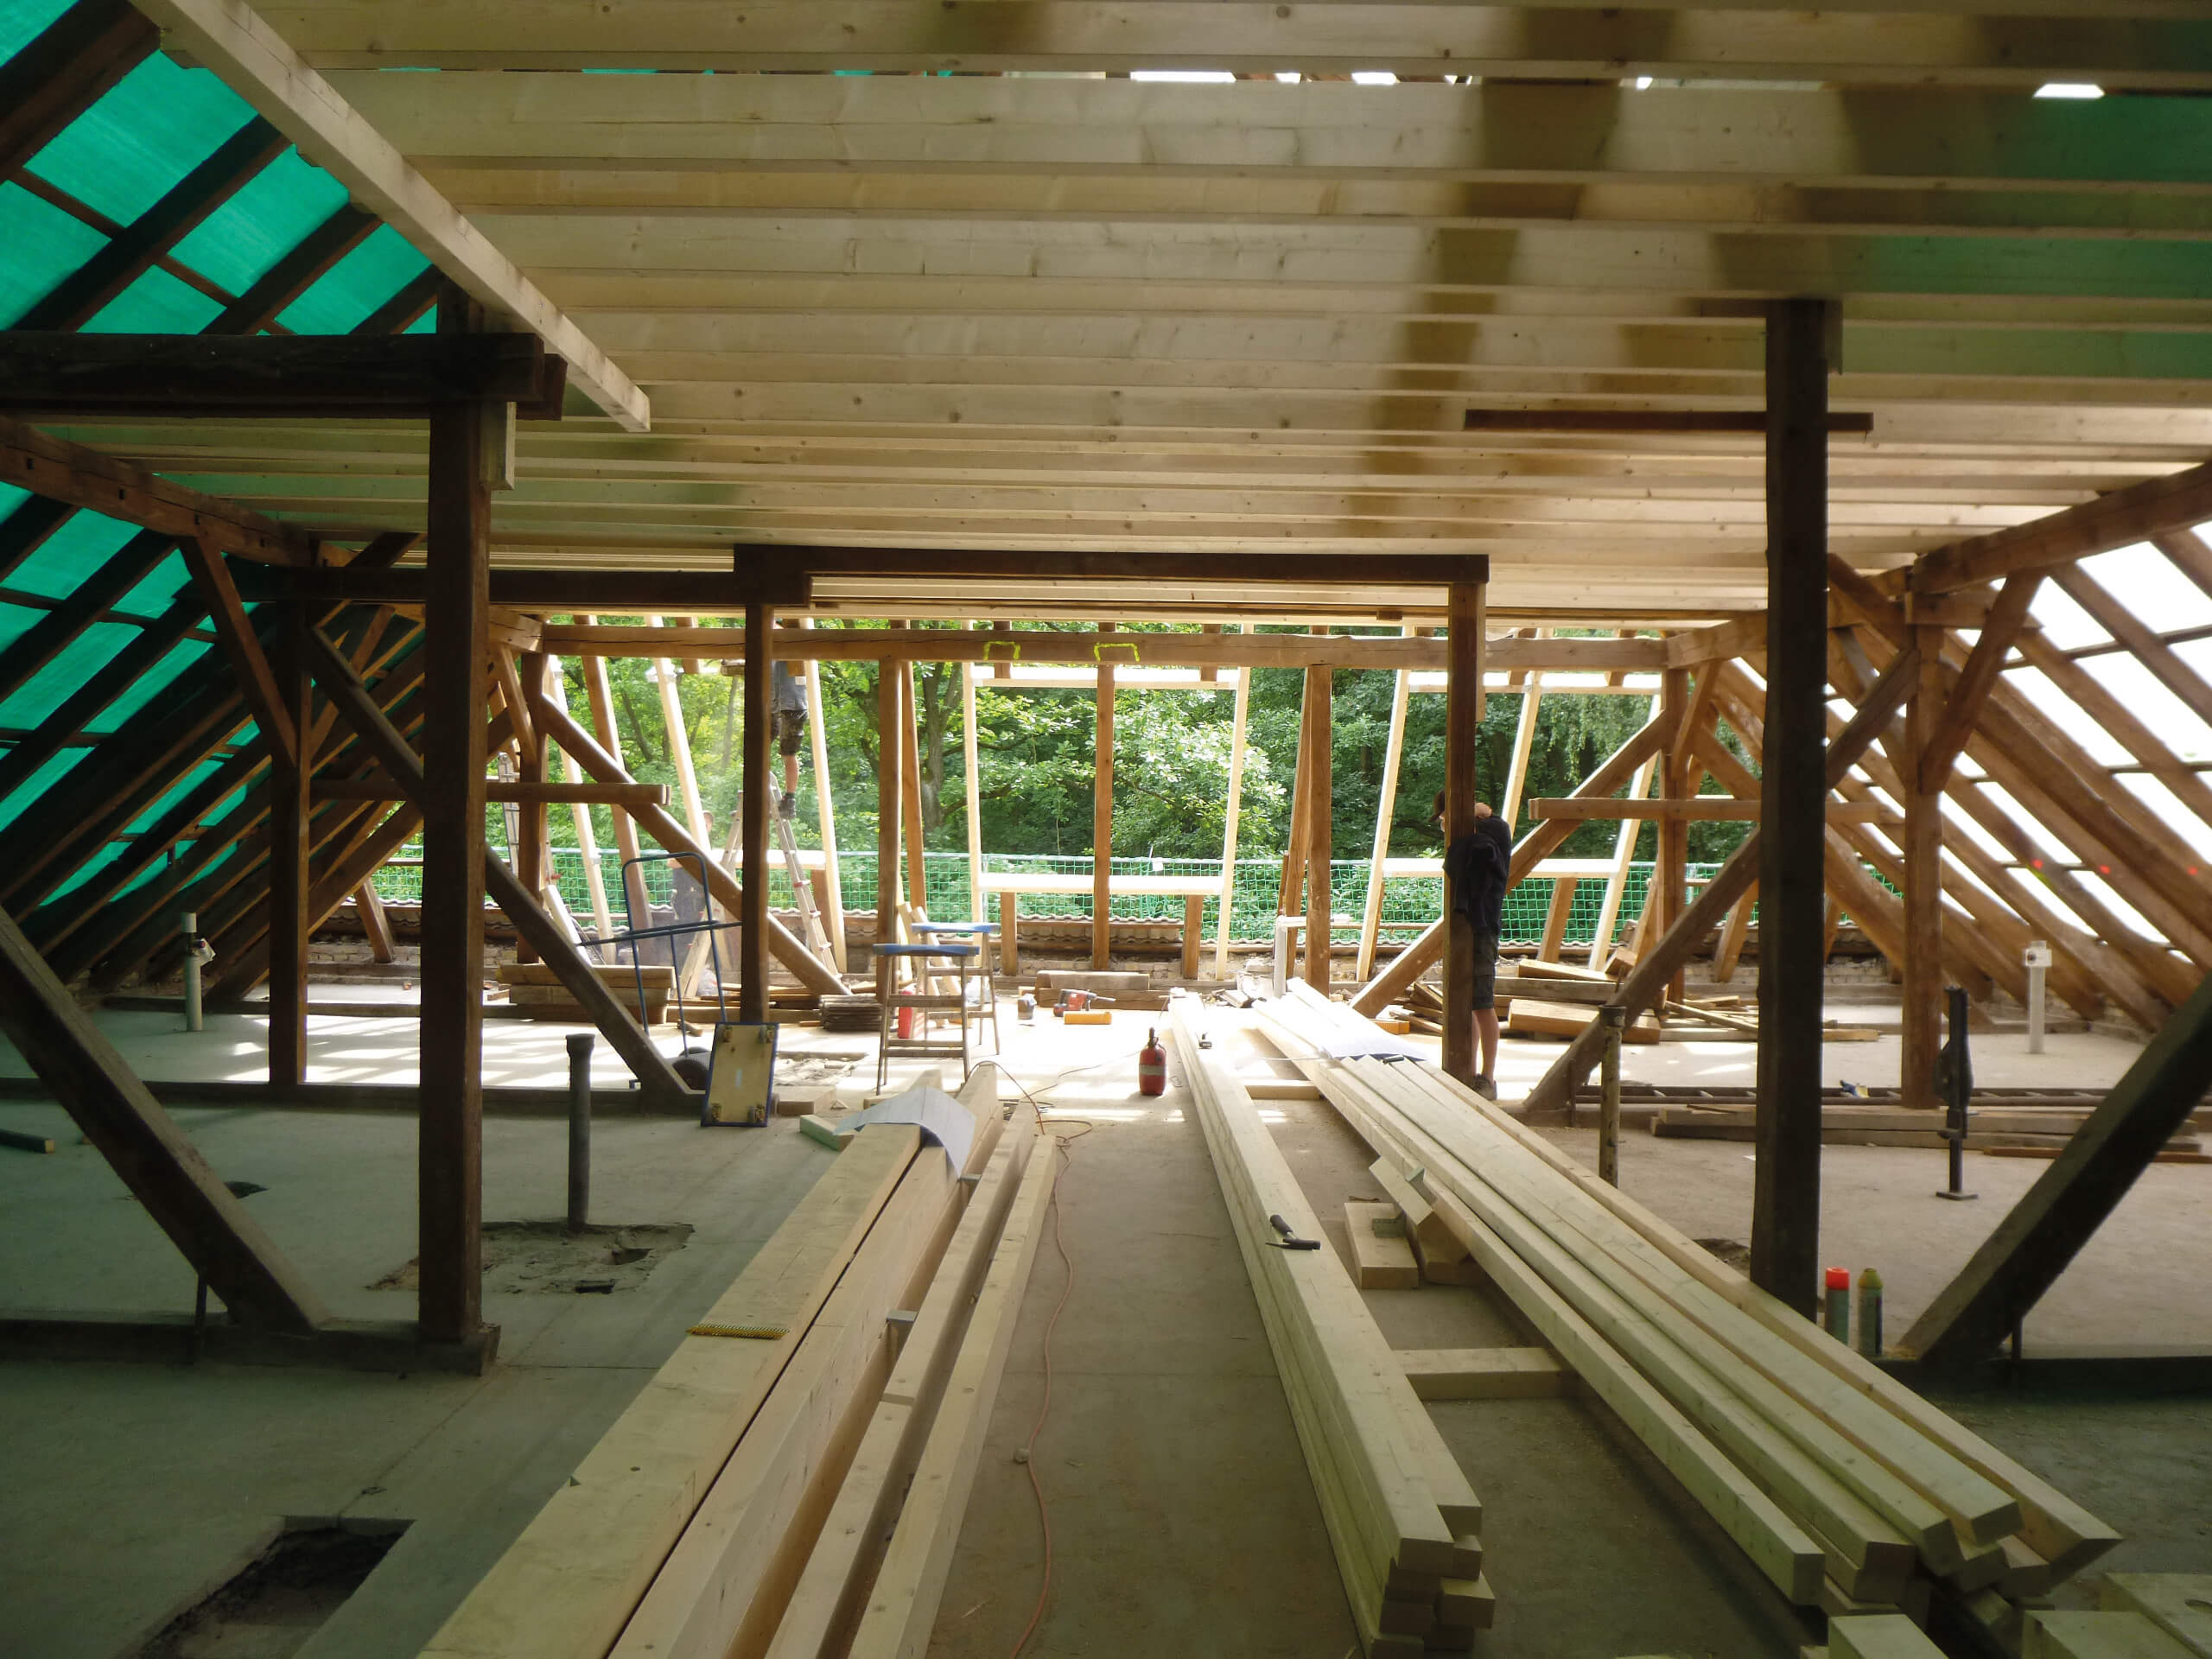 Ausbauarbeiten am Dach der Grundschule Potsdam